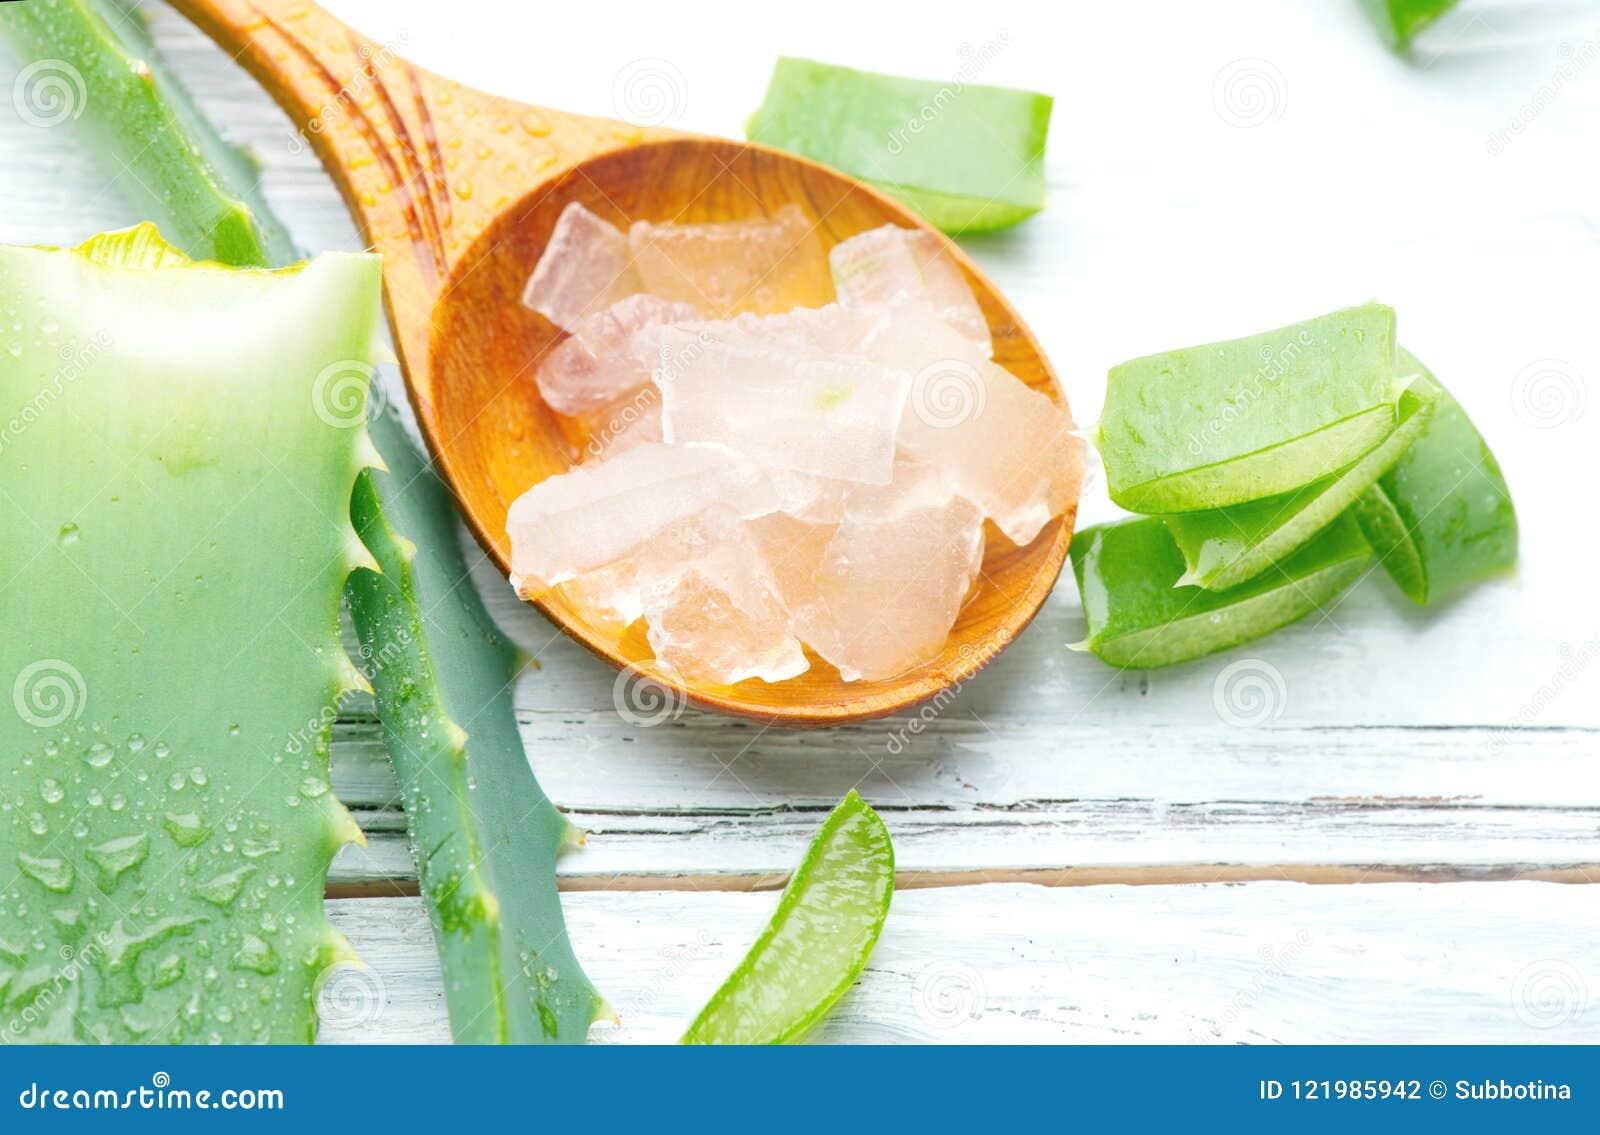 Aloe Vera Gel Closeup On White Wooden Background  Organic